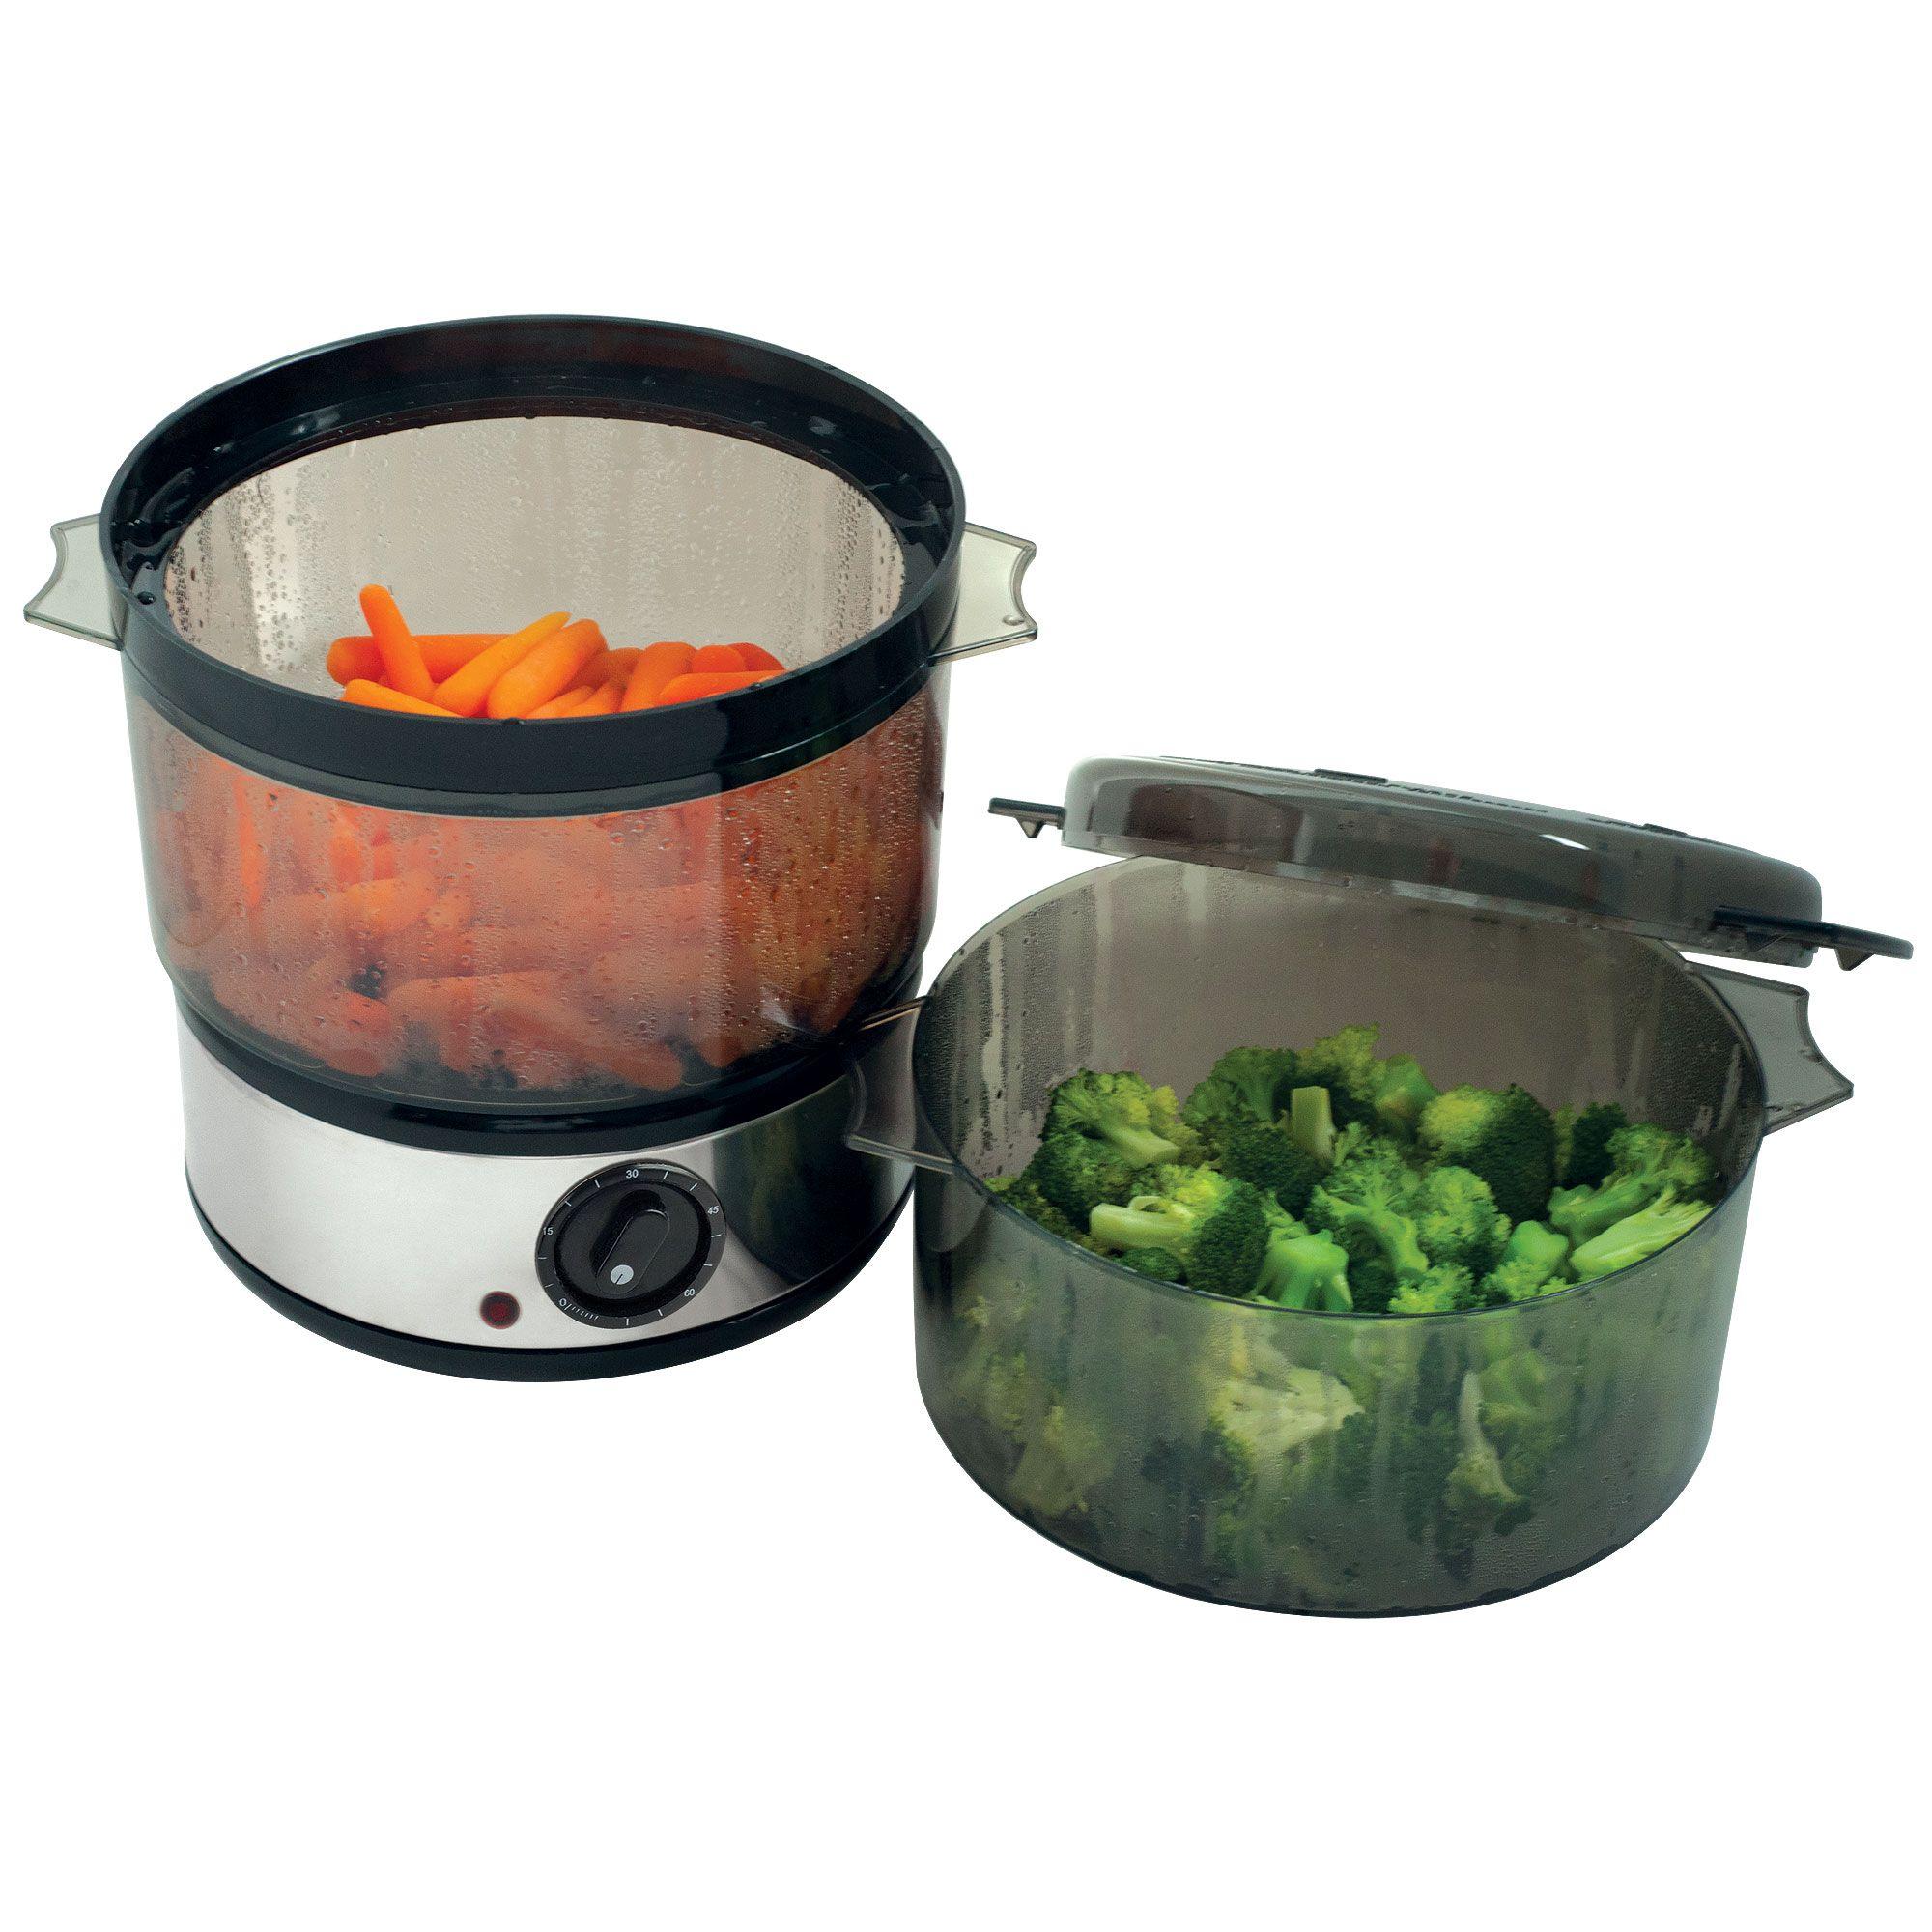 Chef Buddy 400 Watt Stainless Steel Food Steamer - 4 Quart Capacity